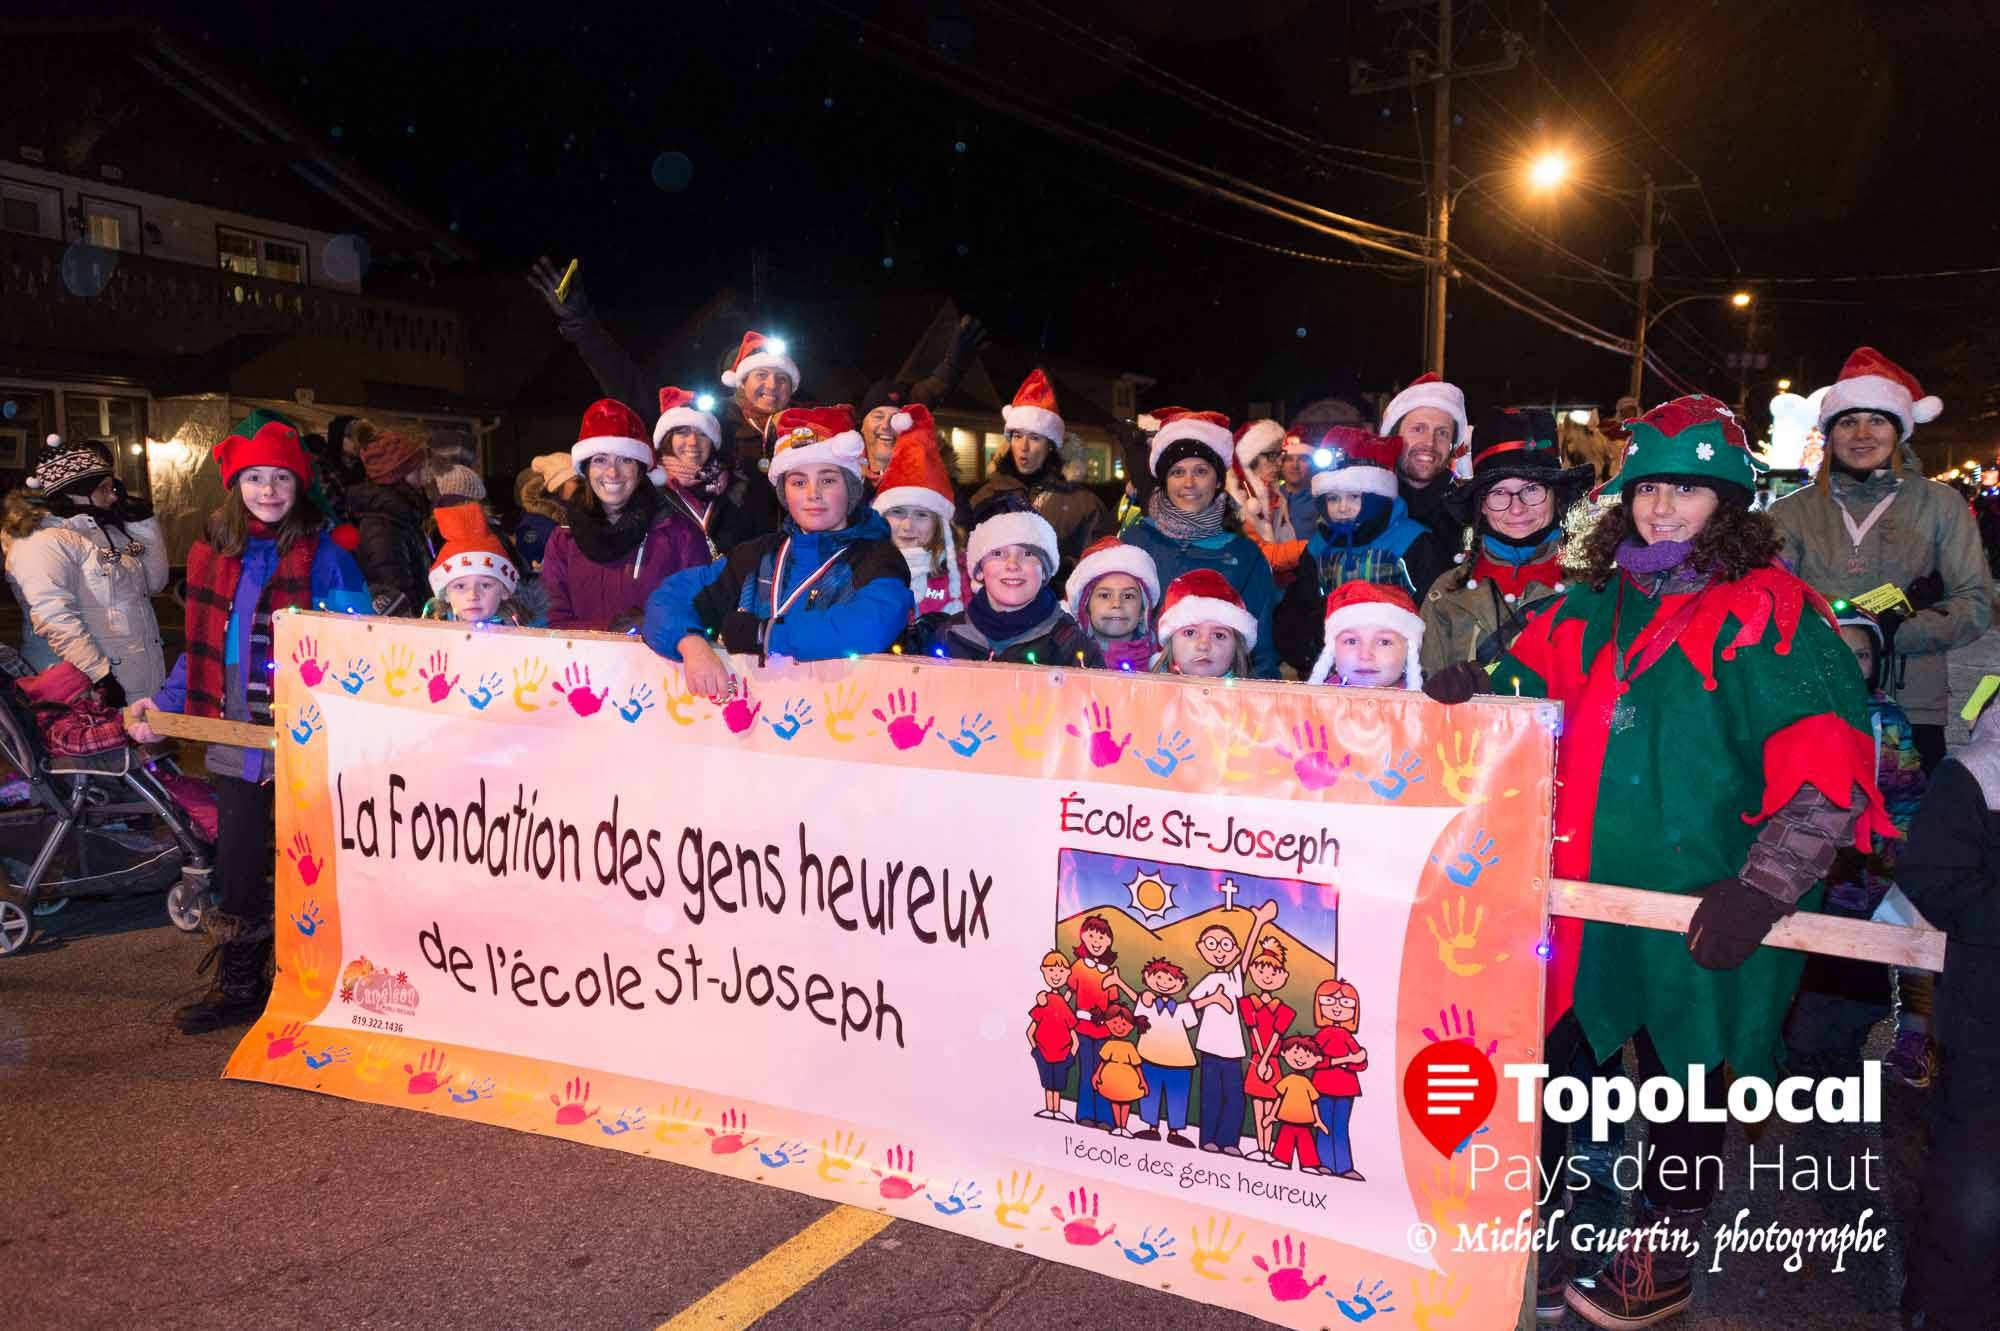 20161203-saint-sauveur-parade-pere-noel-chambre-commerce-15